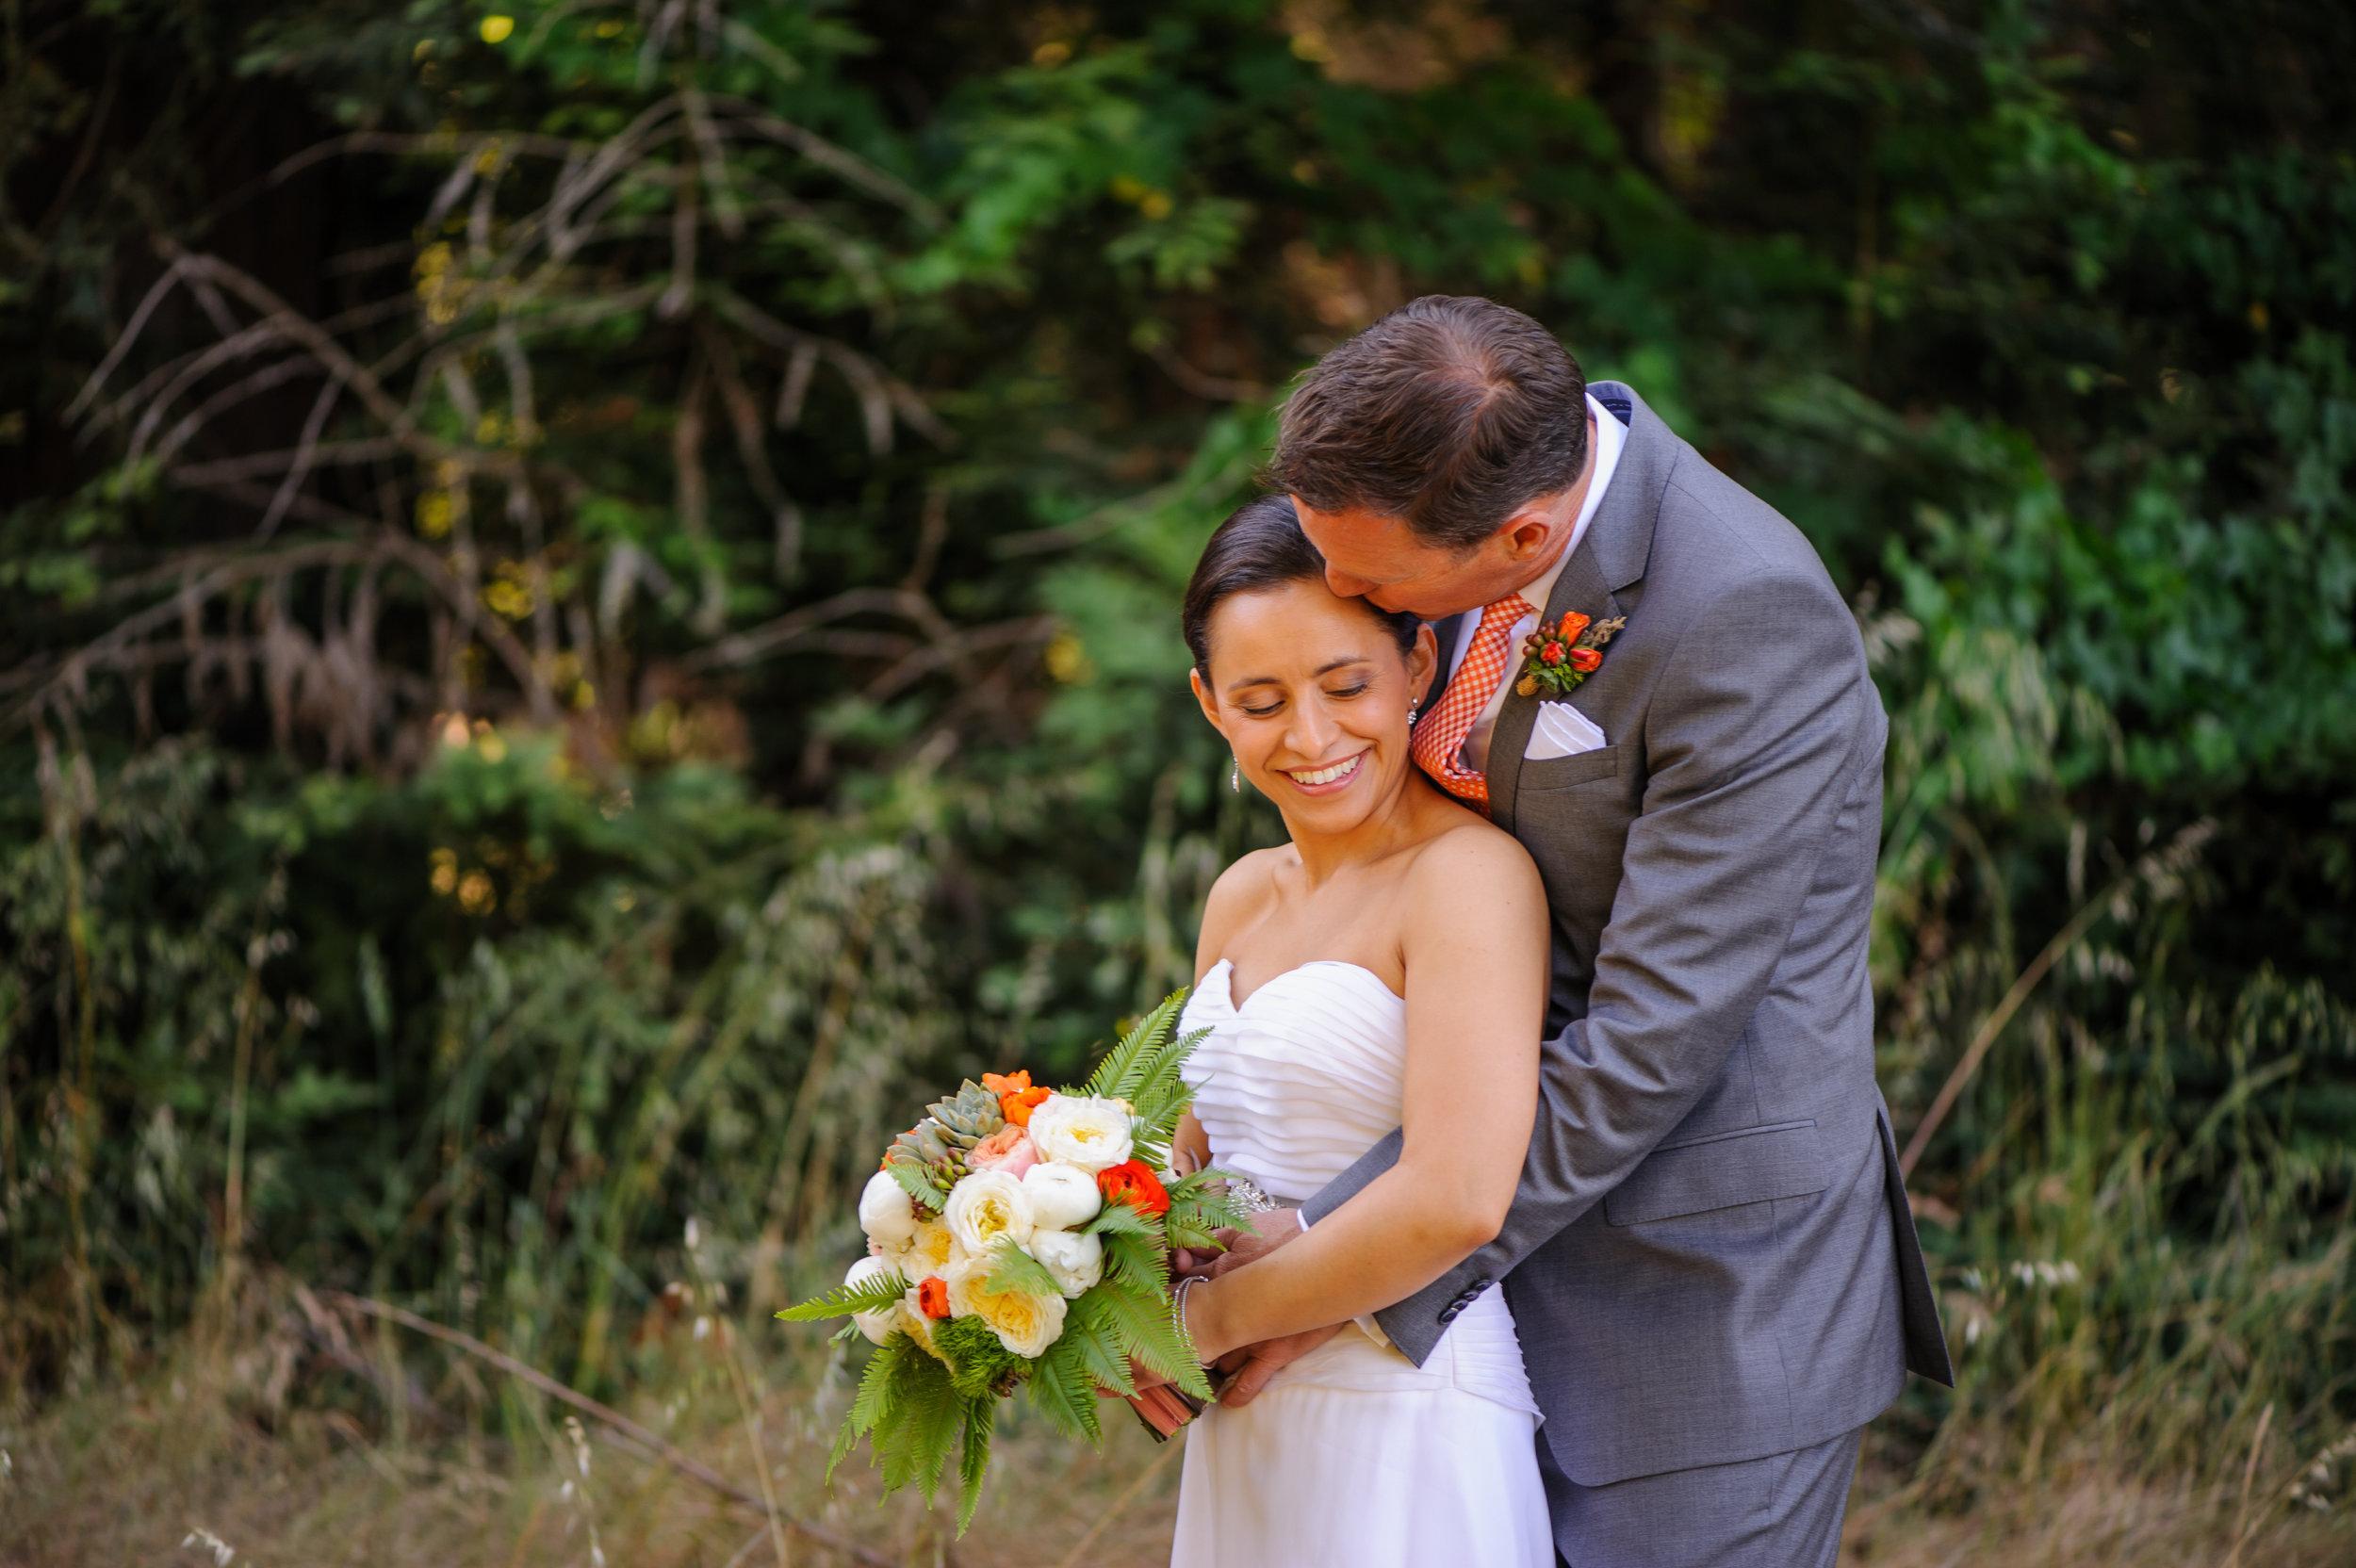 janet-jeremy-011-mountain-terrace-woodside-wedding-photographer-katherine-nicole-photography.JPG